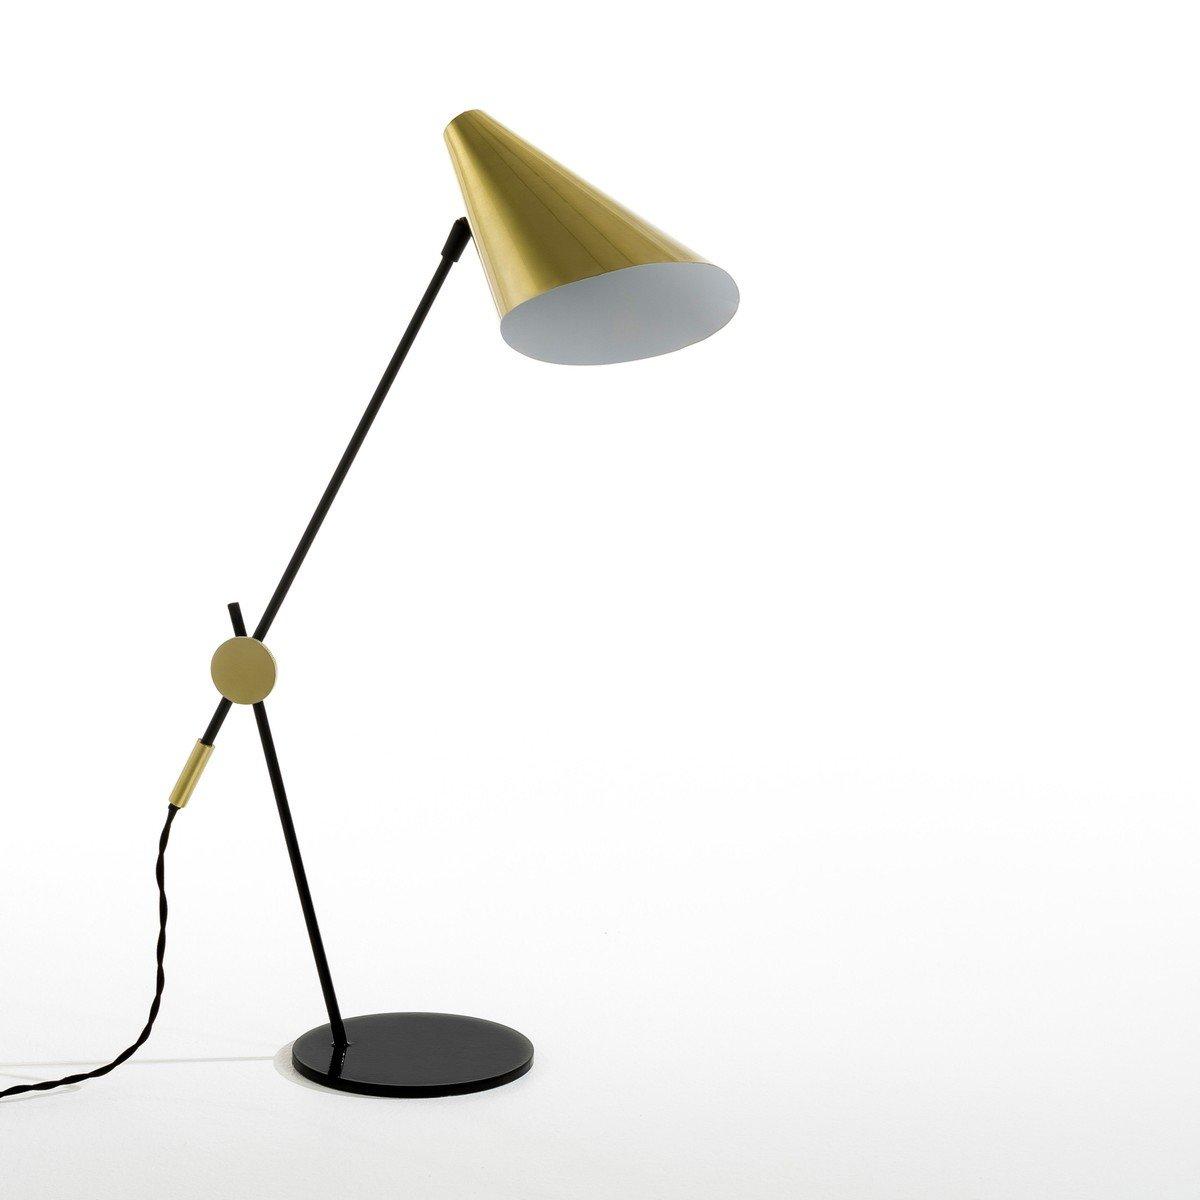 La Redoute AM.PM lámpara de mesa Barea: Amazon.es: Hogar